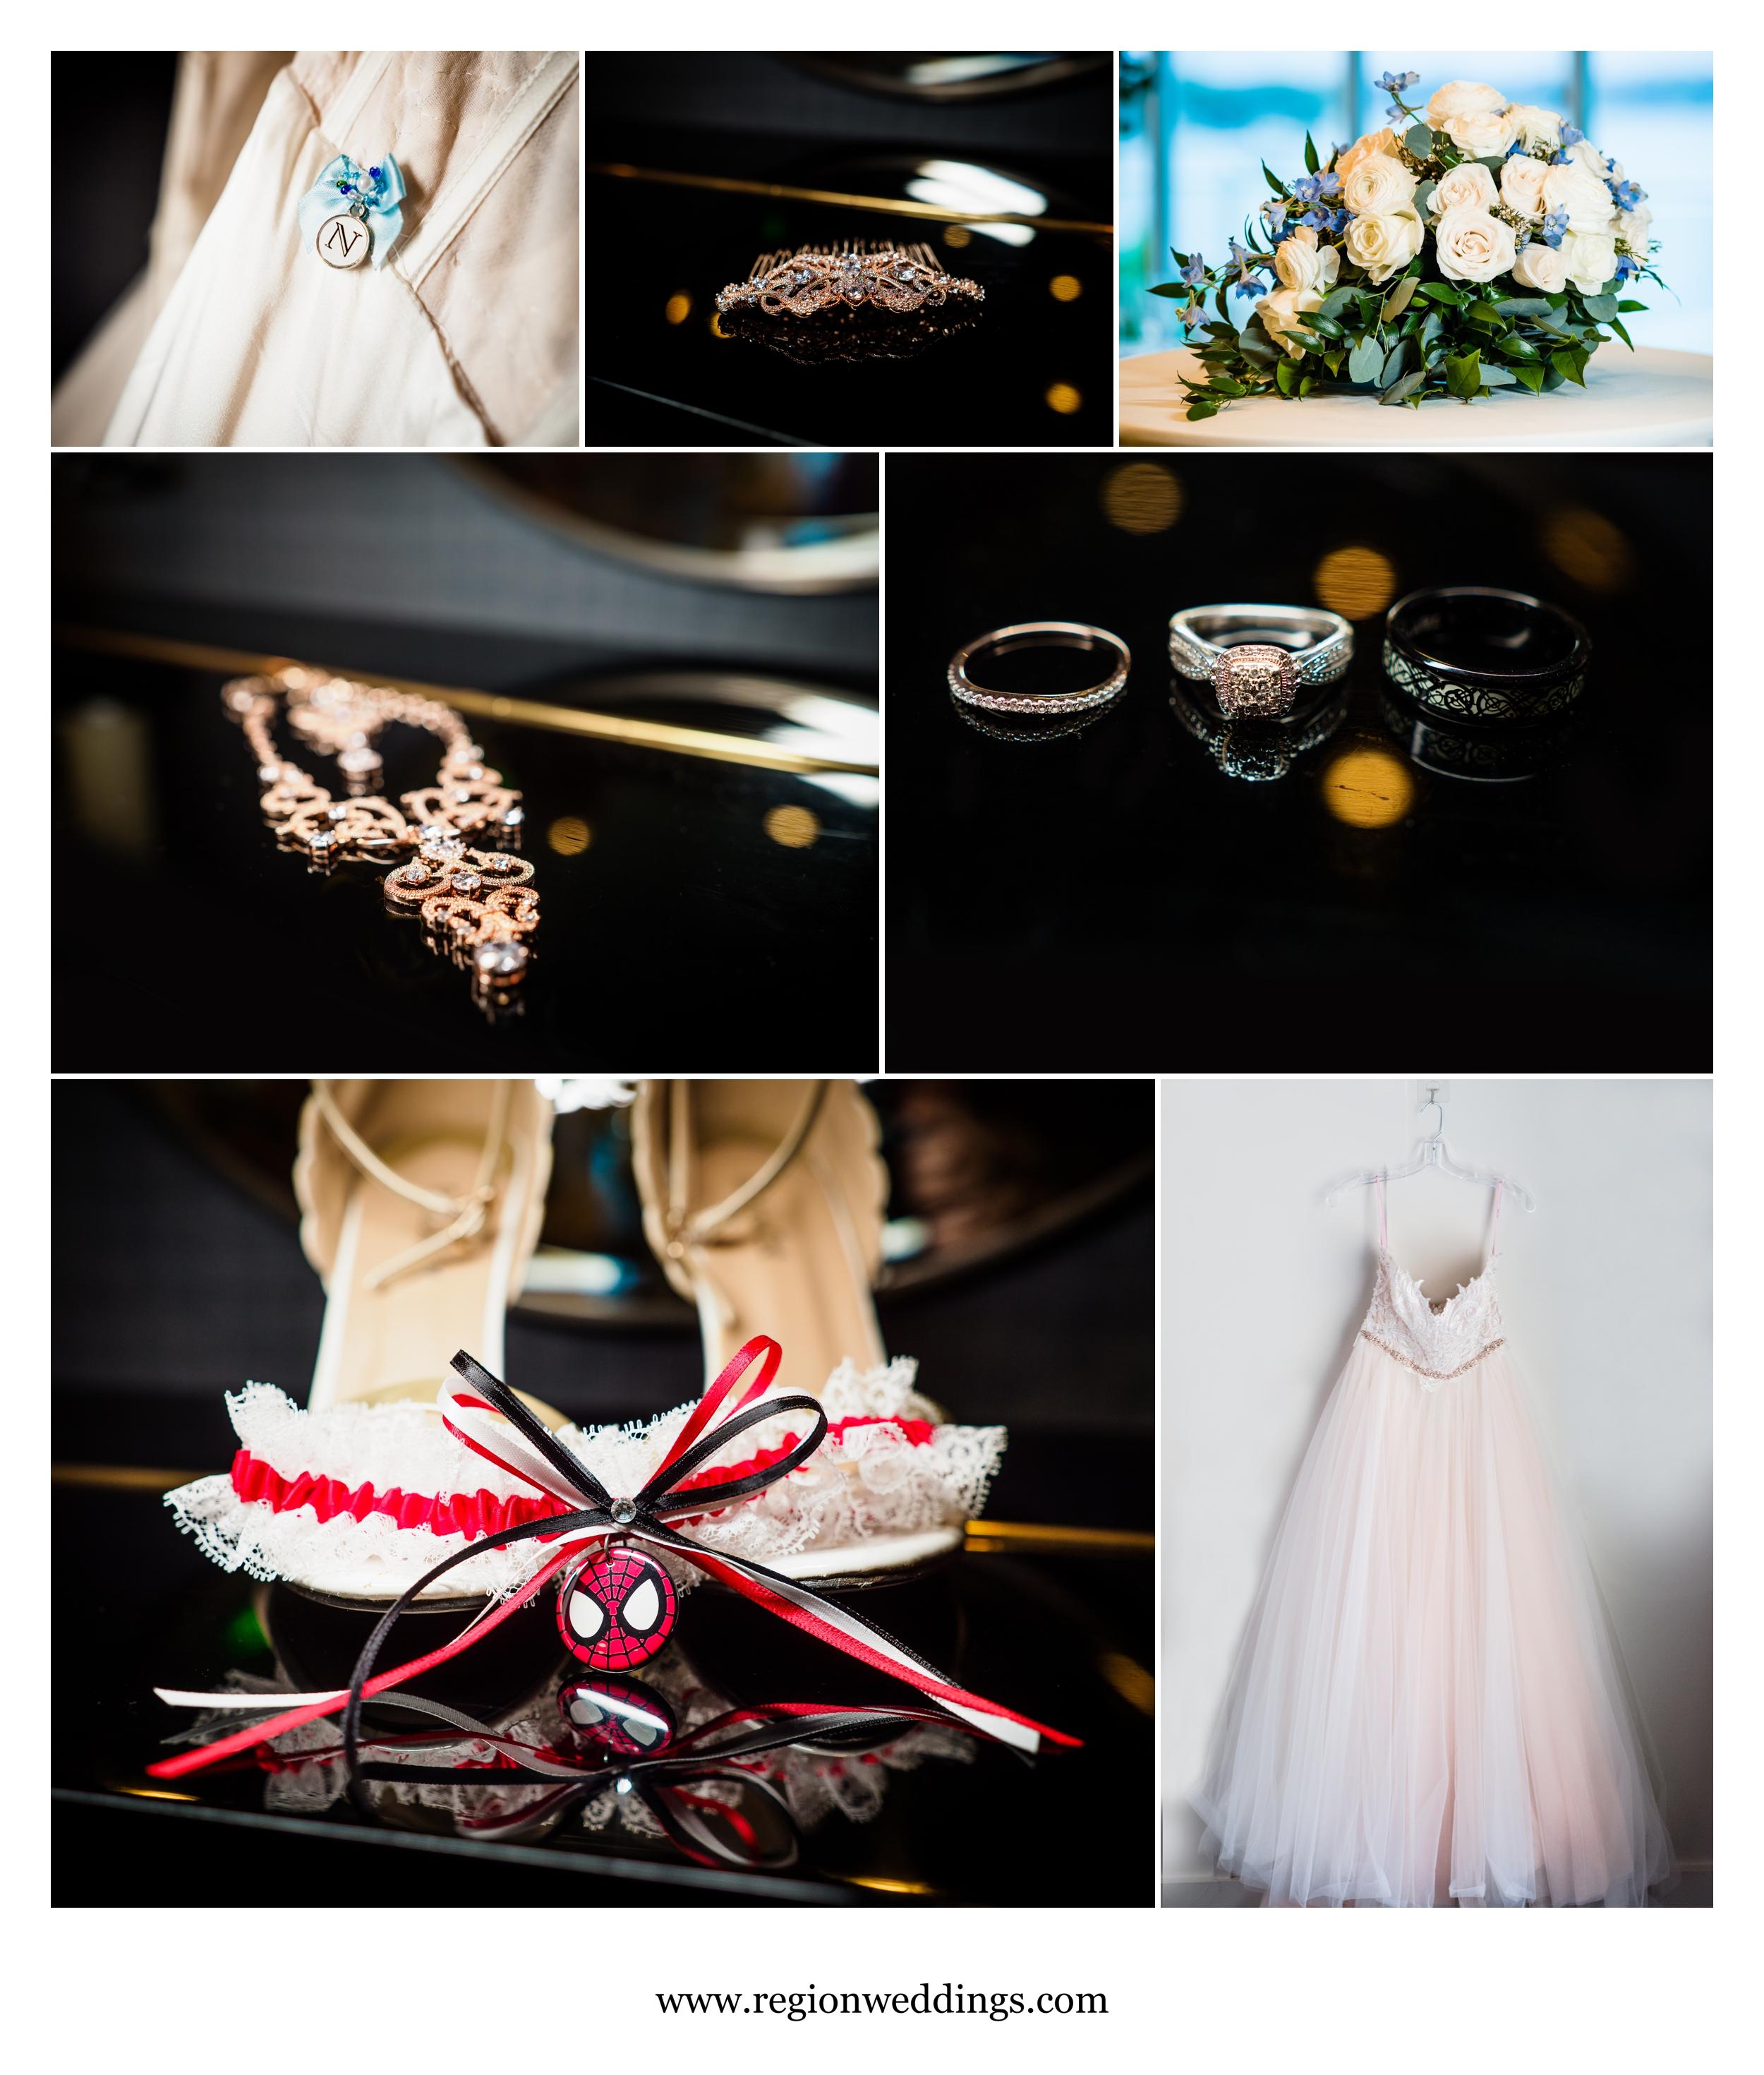 Bridal decor at Lighthouse Restaurant in Cedar Lake, Indiana.